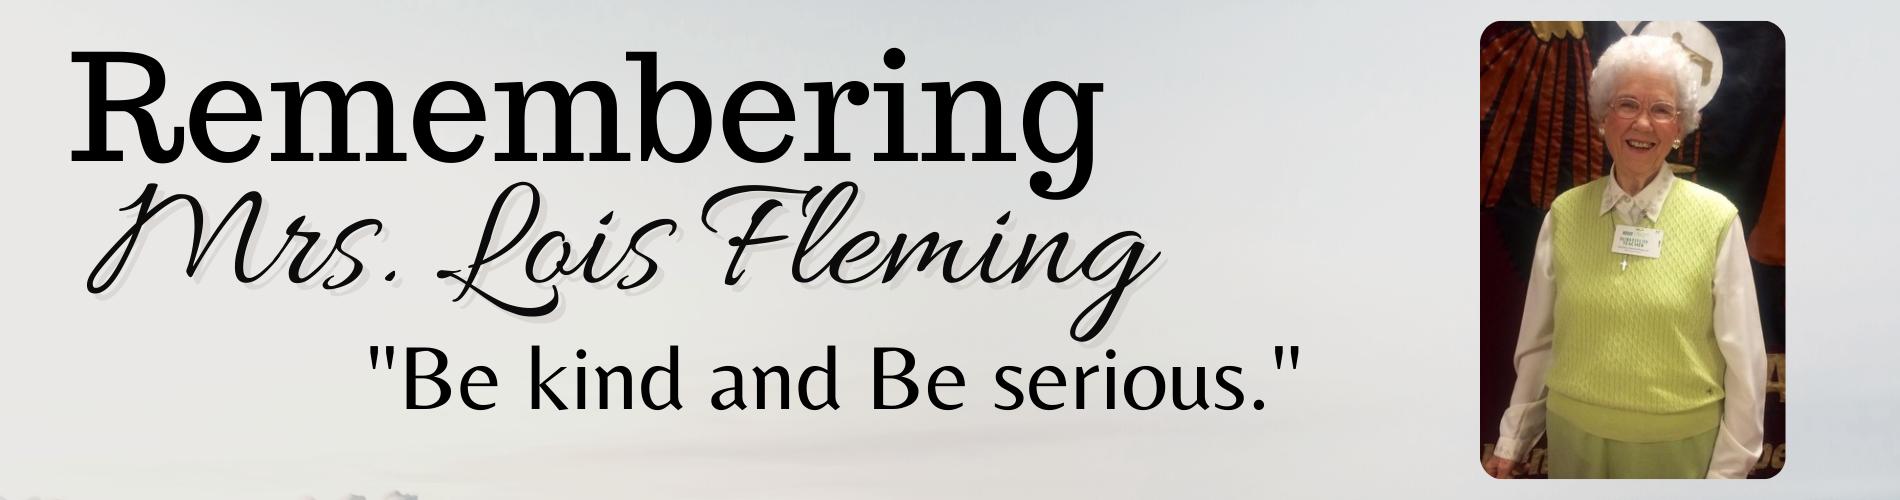 Remembering Mrs. Lois Fleming